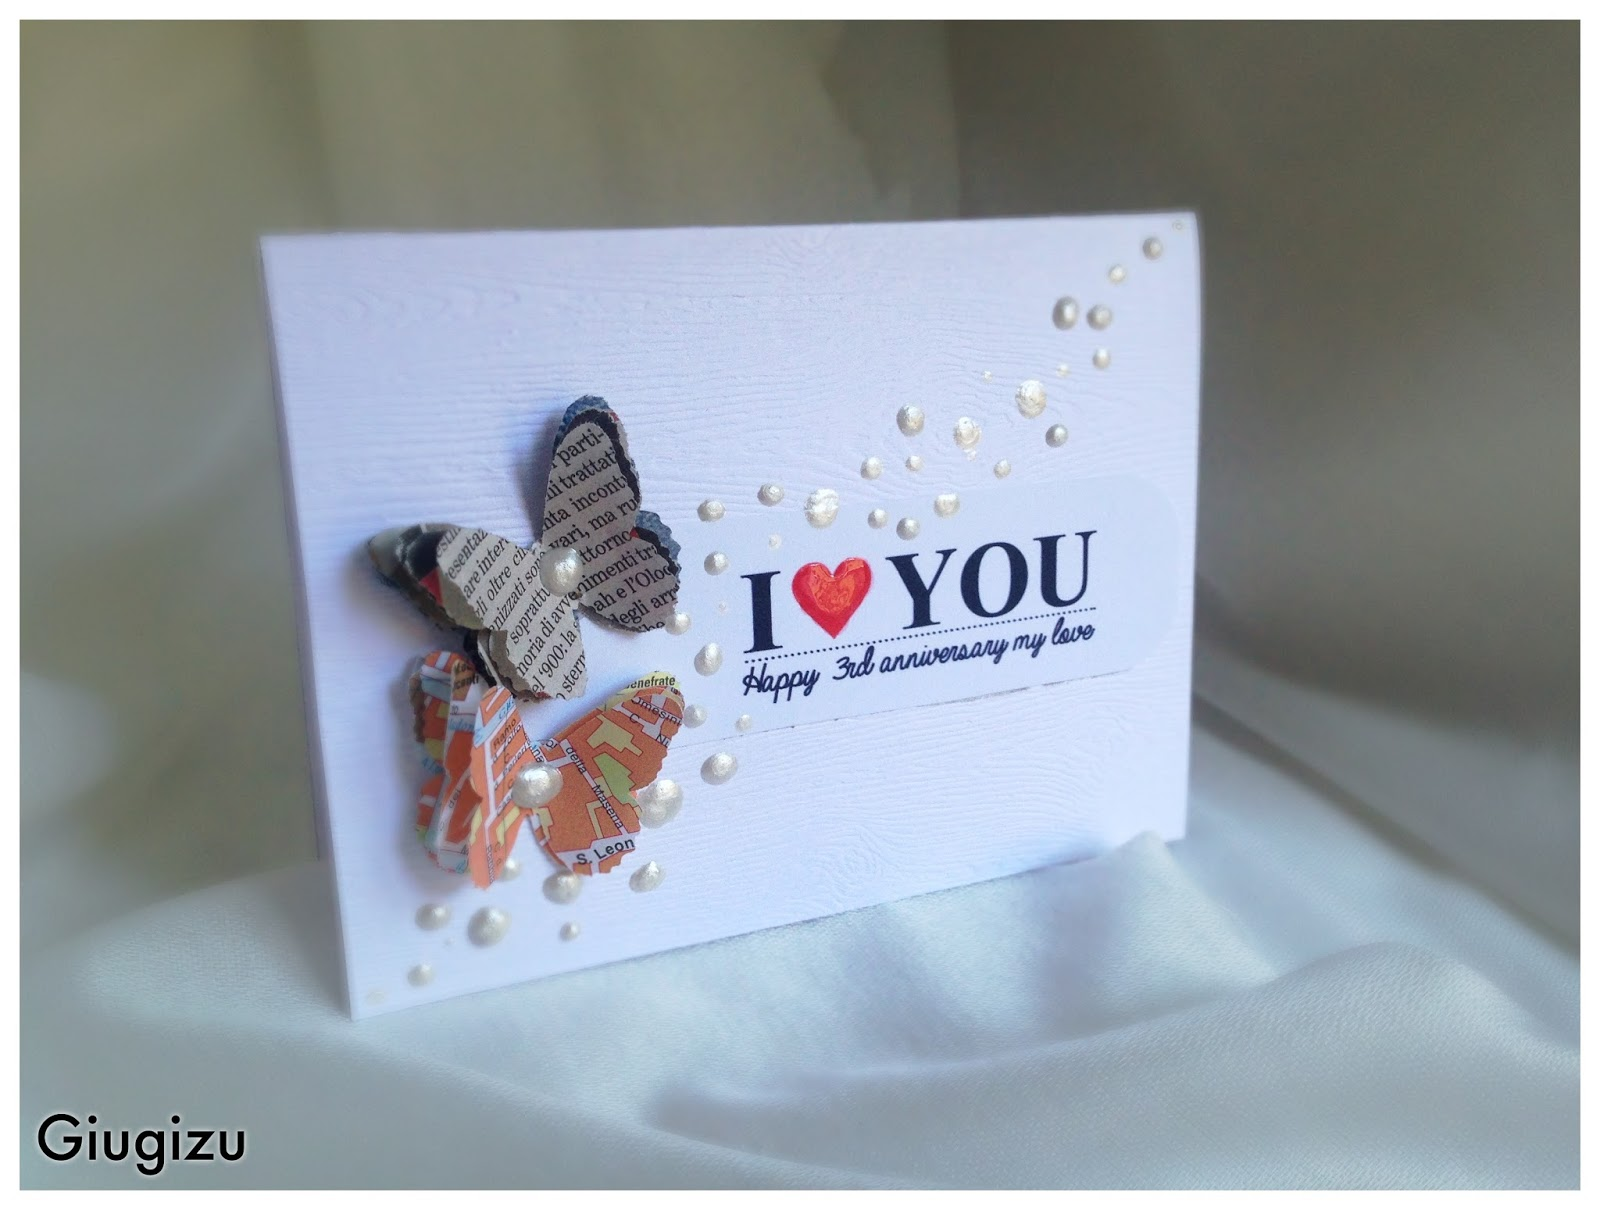 Connu Giugizu's corner: Handmade wedding anniversary card - Biglietto  GD21